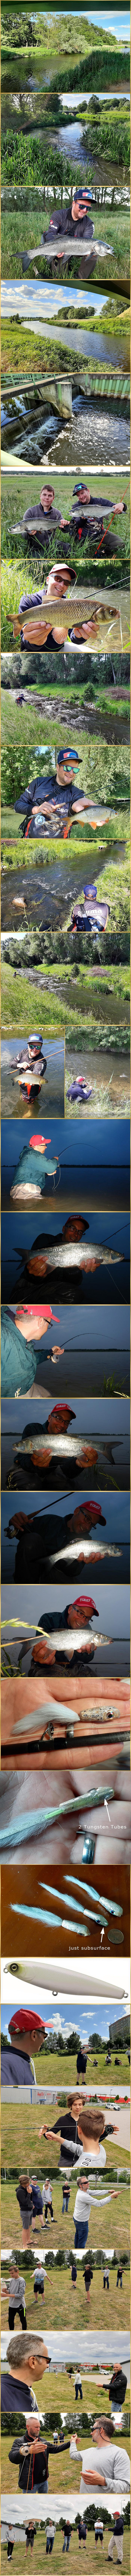 asp-fishing